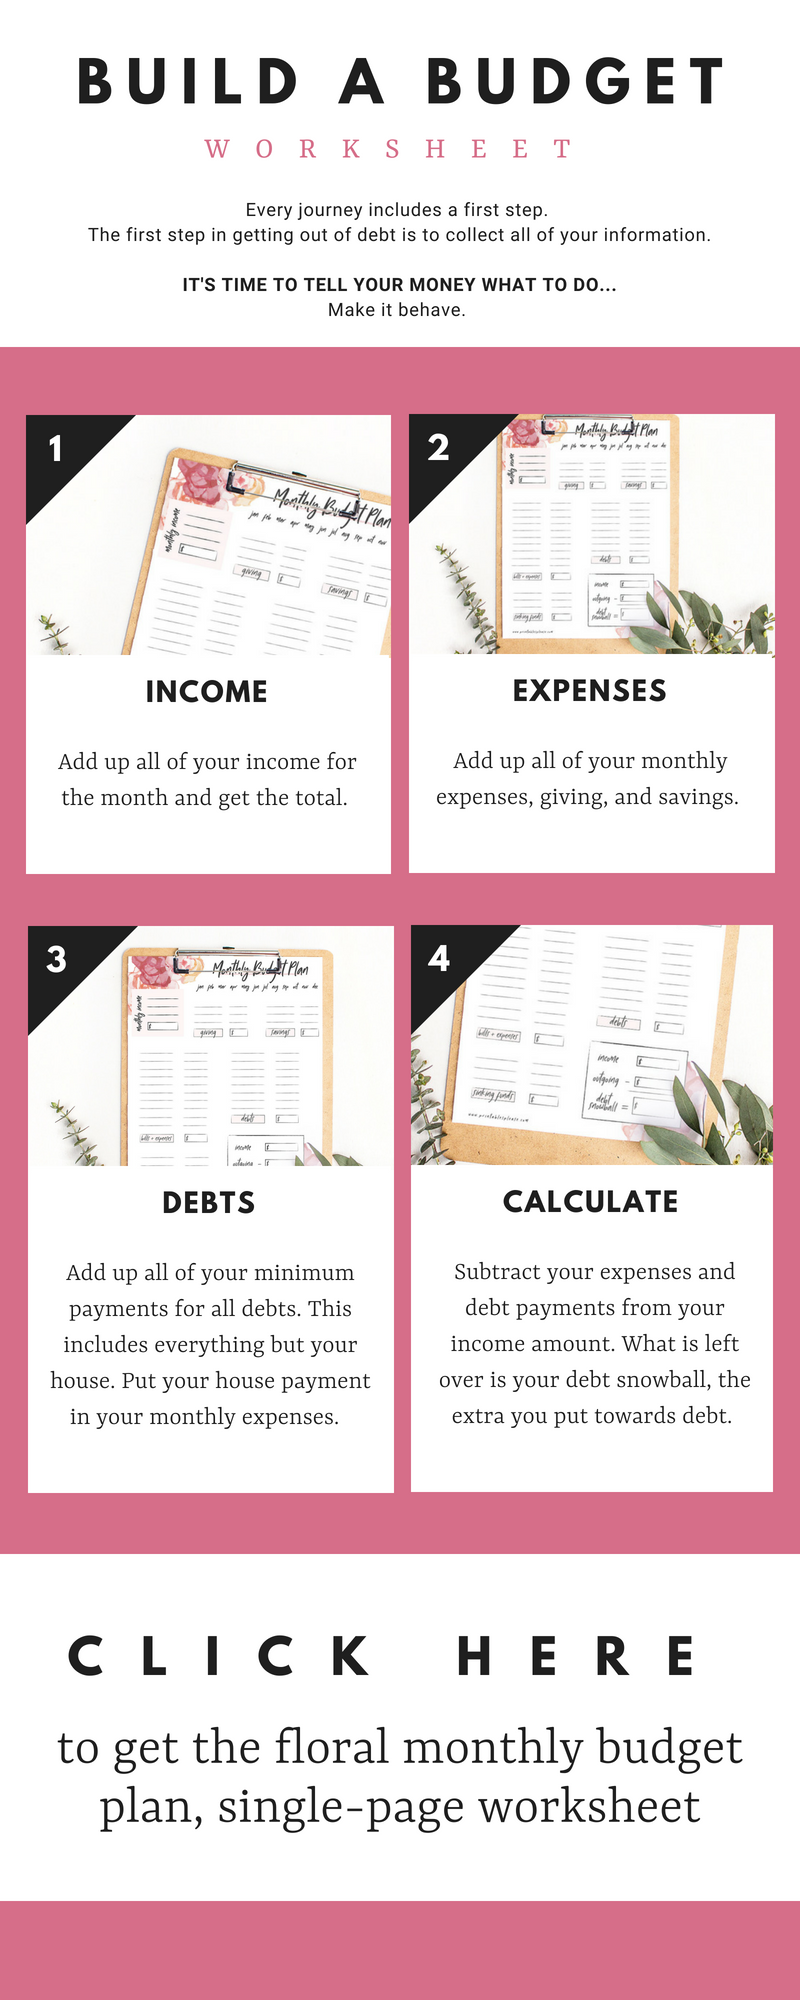 A single page printable budget worksheet to help you list